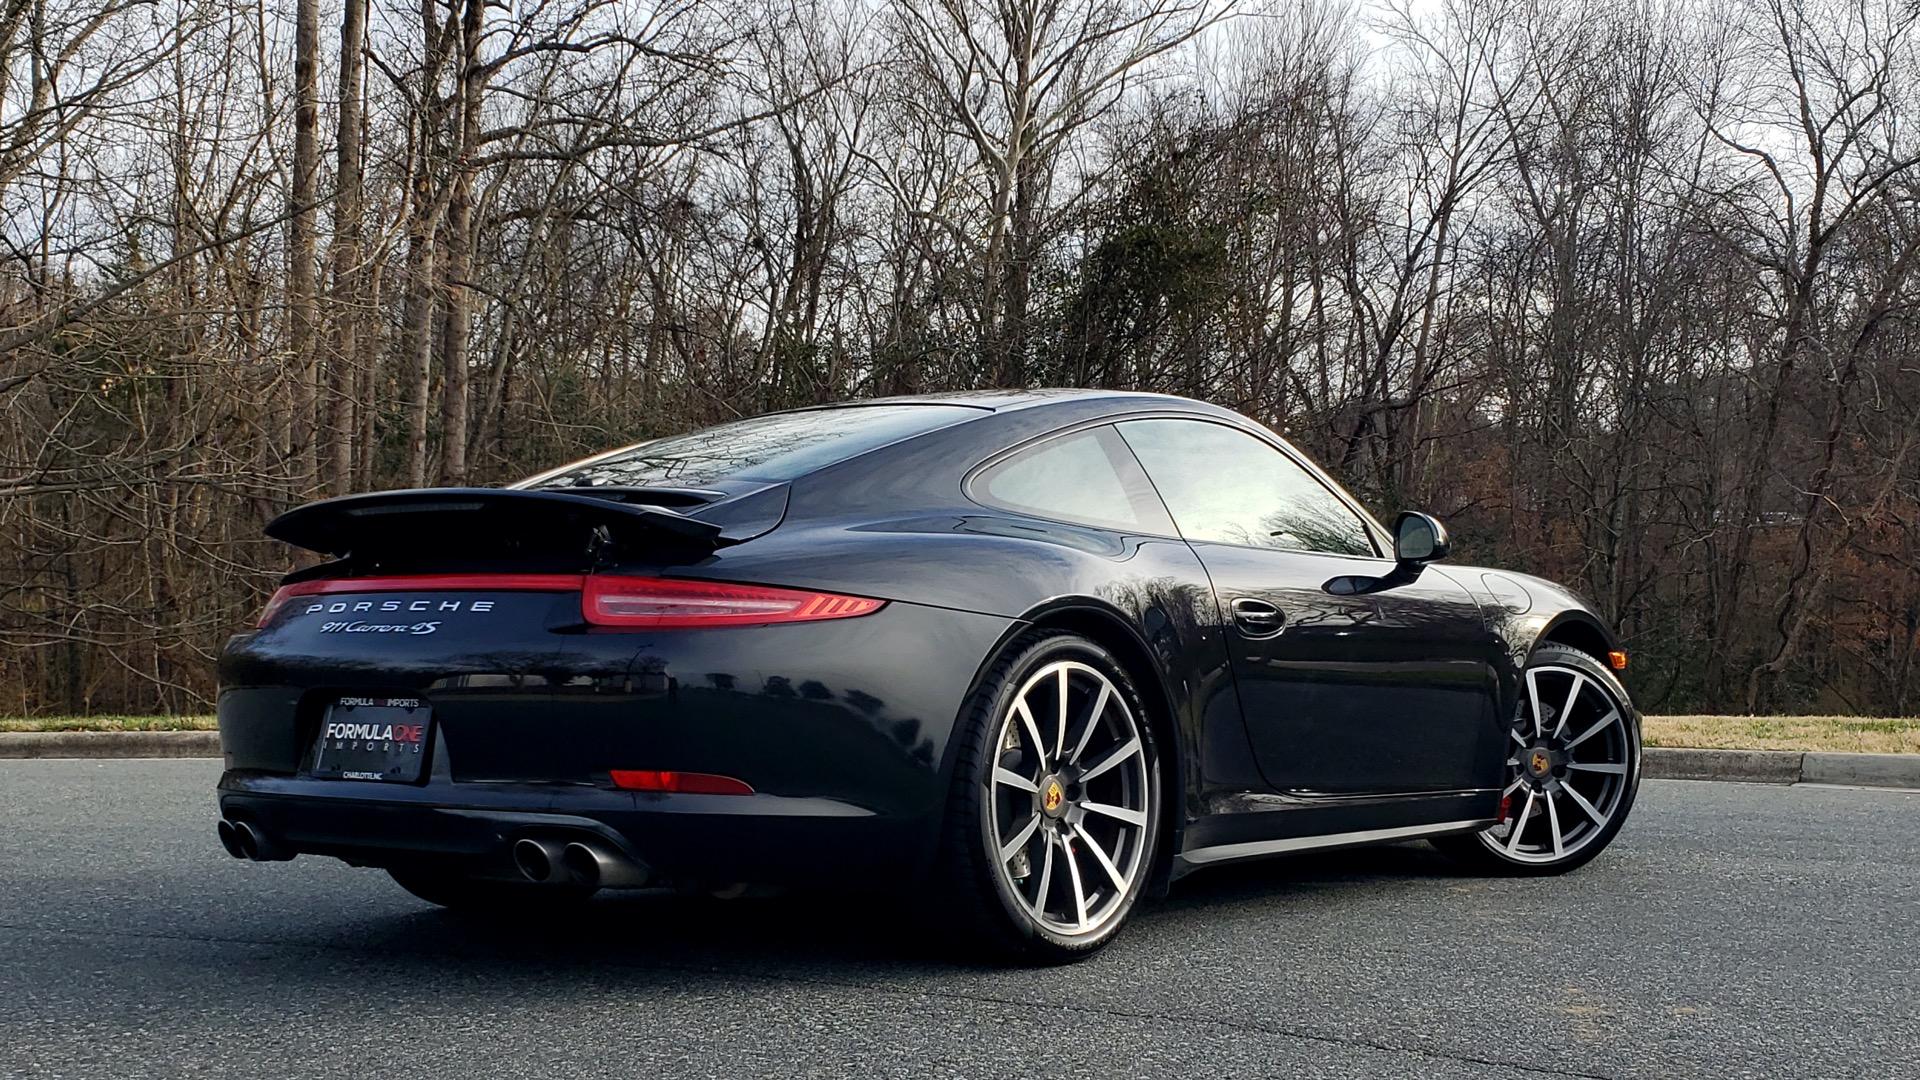 Used 2014 Porsche 911 CARRERA 4S / PREM PKG PLUS / NAV / SUNROO / BOSE / CHRONO for sale Sold at Formula Imports in Charlotte NC 28227 10